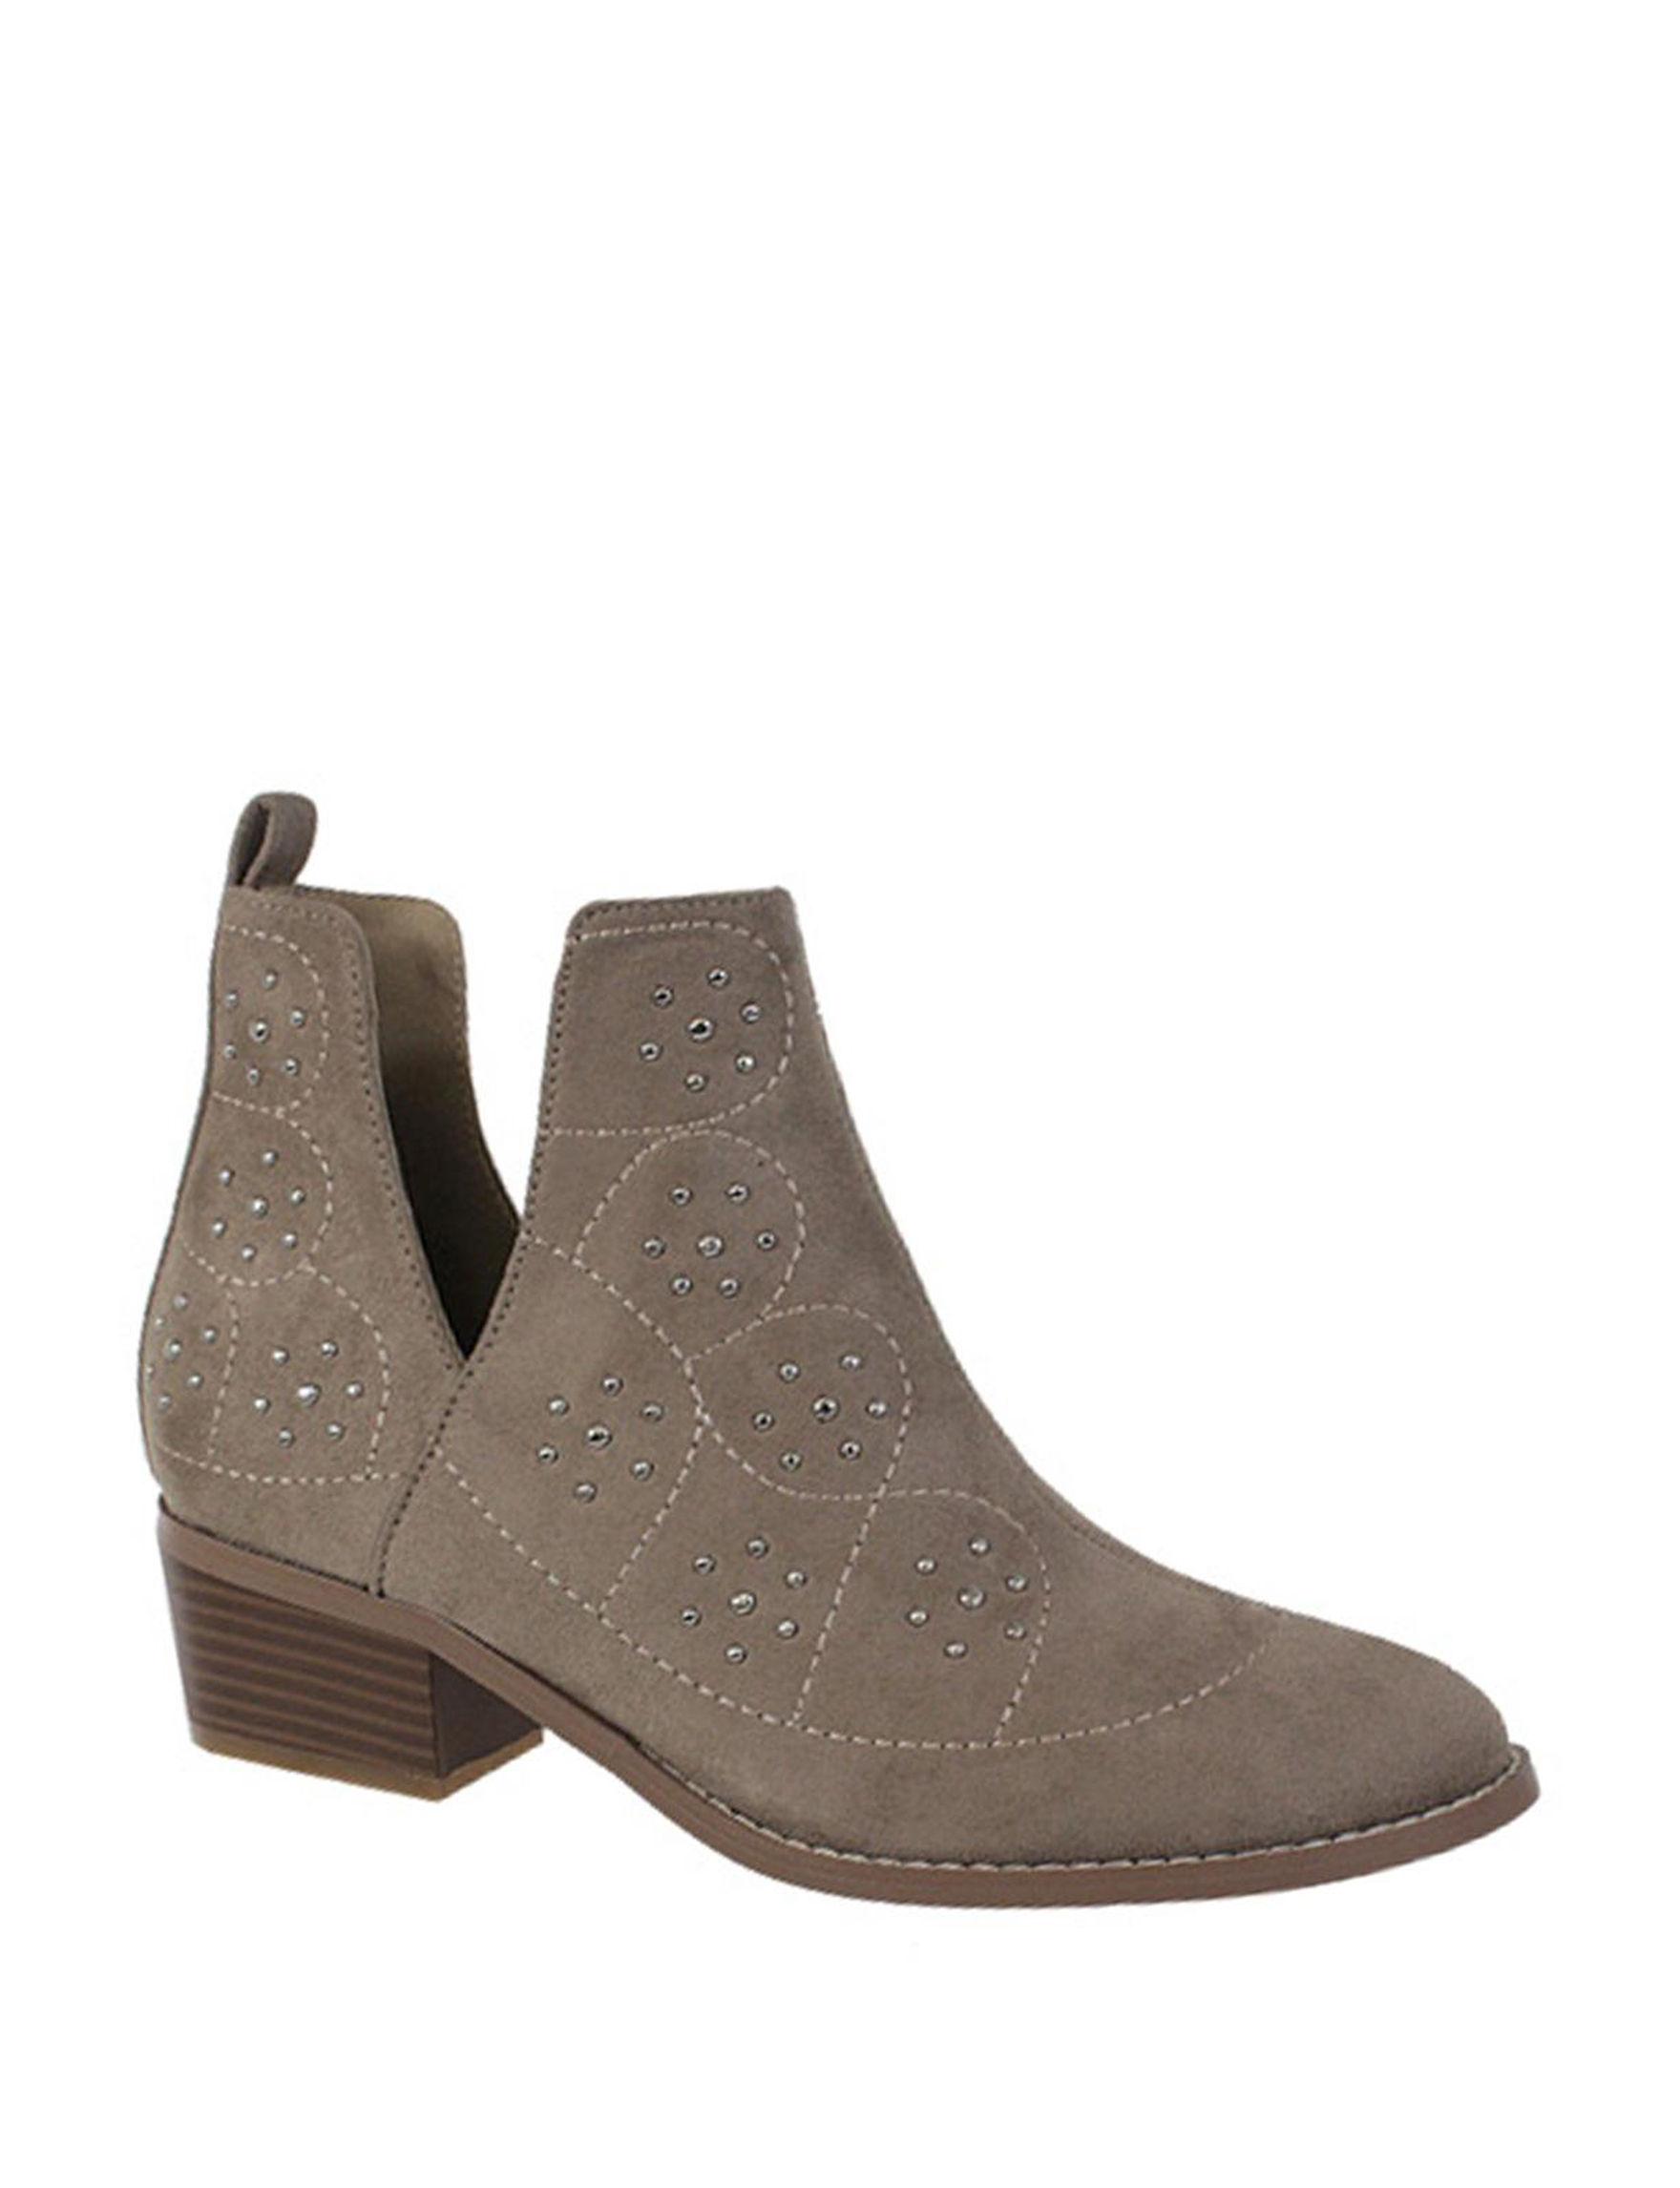 Yoki Beige Ankle Boots & Booties